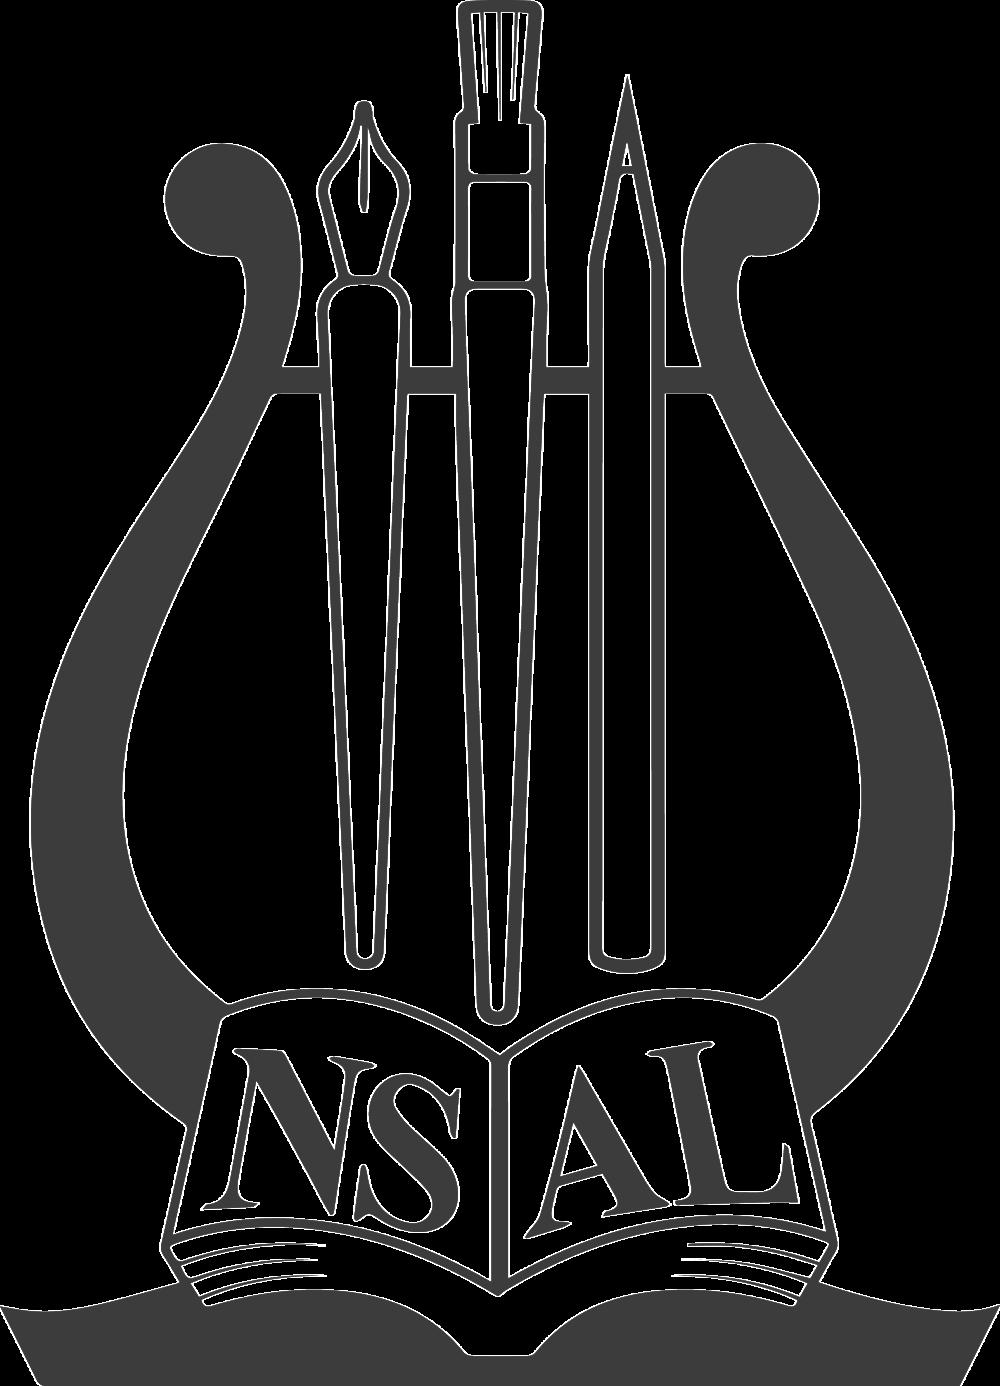 Clipart sun and sun gluses arizona clip art black and white stock Member News — NSAL Arizona clip art black and white stock